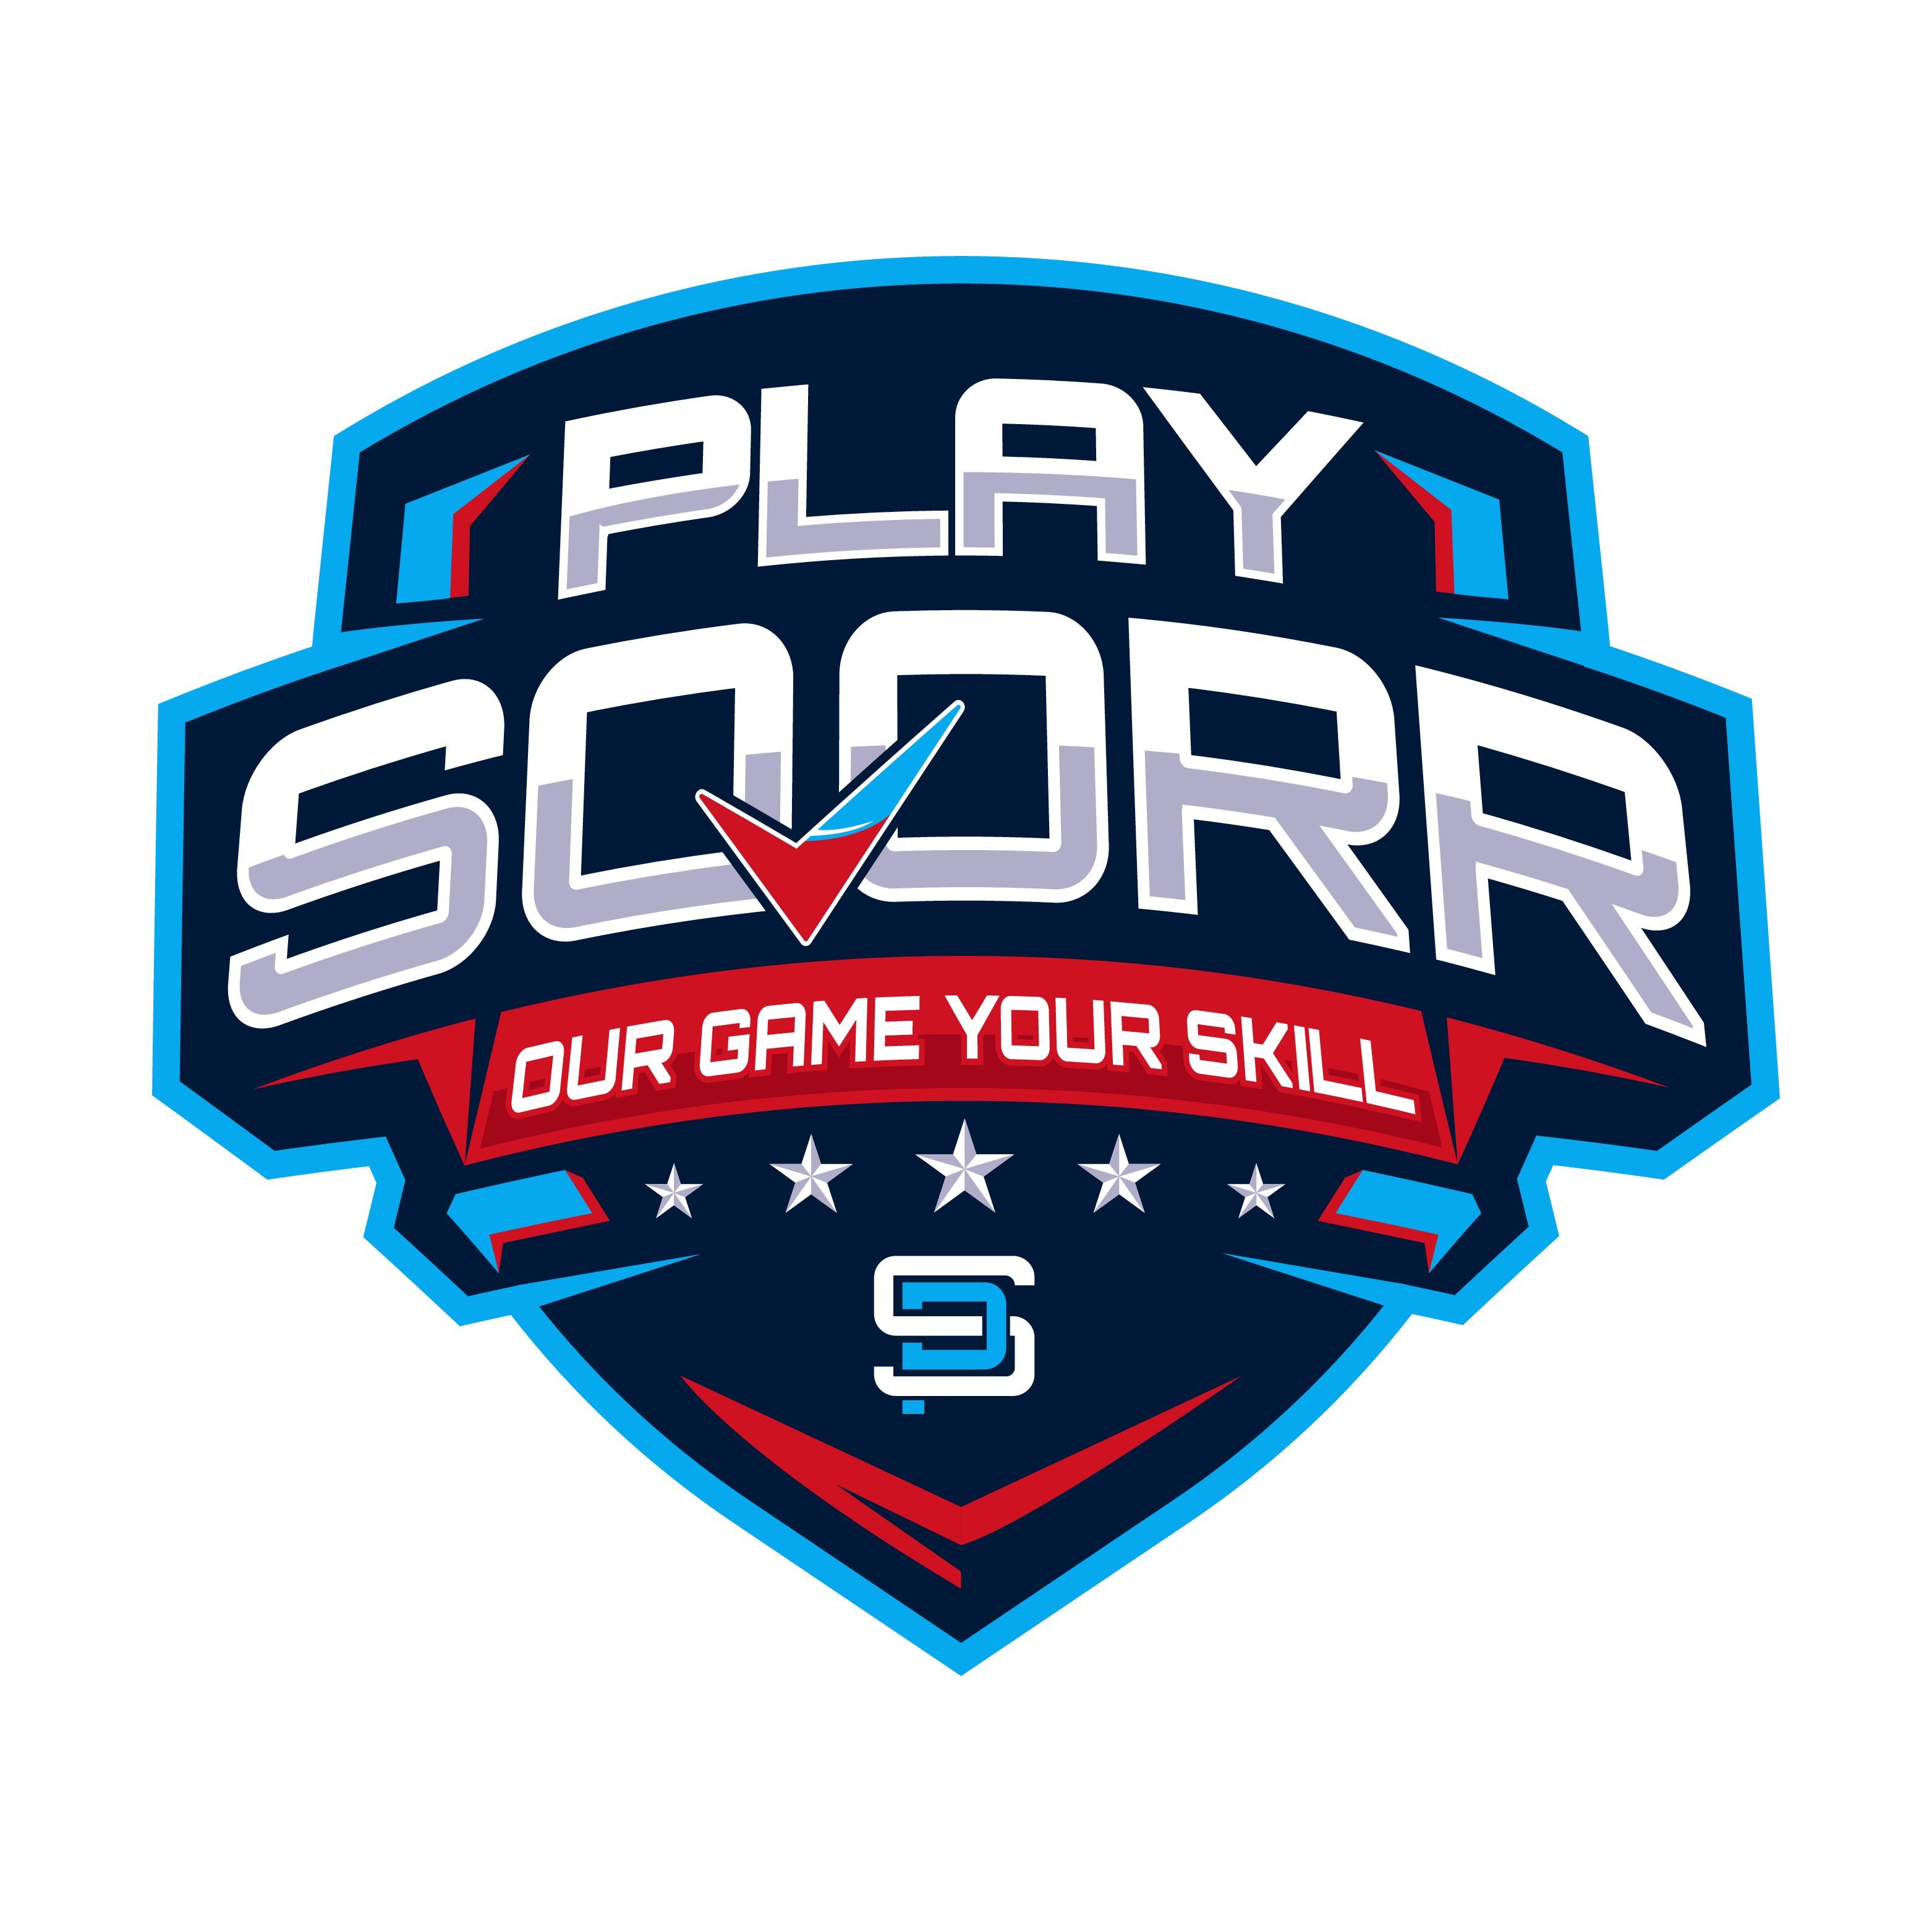 Logo for Next Generation Fantasy Sports Game